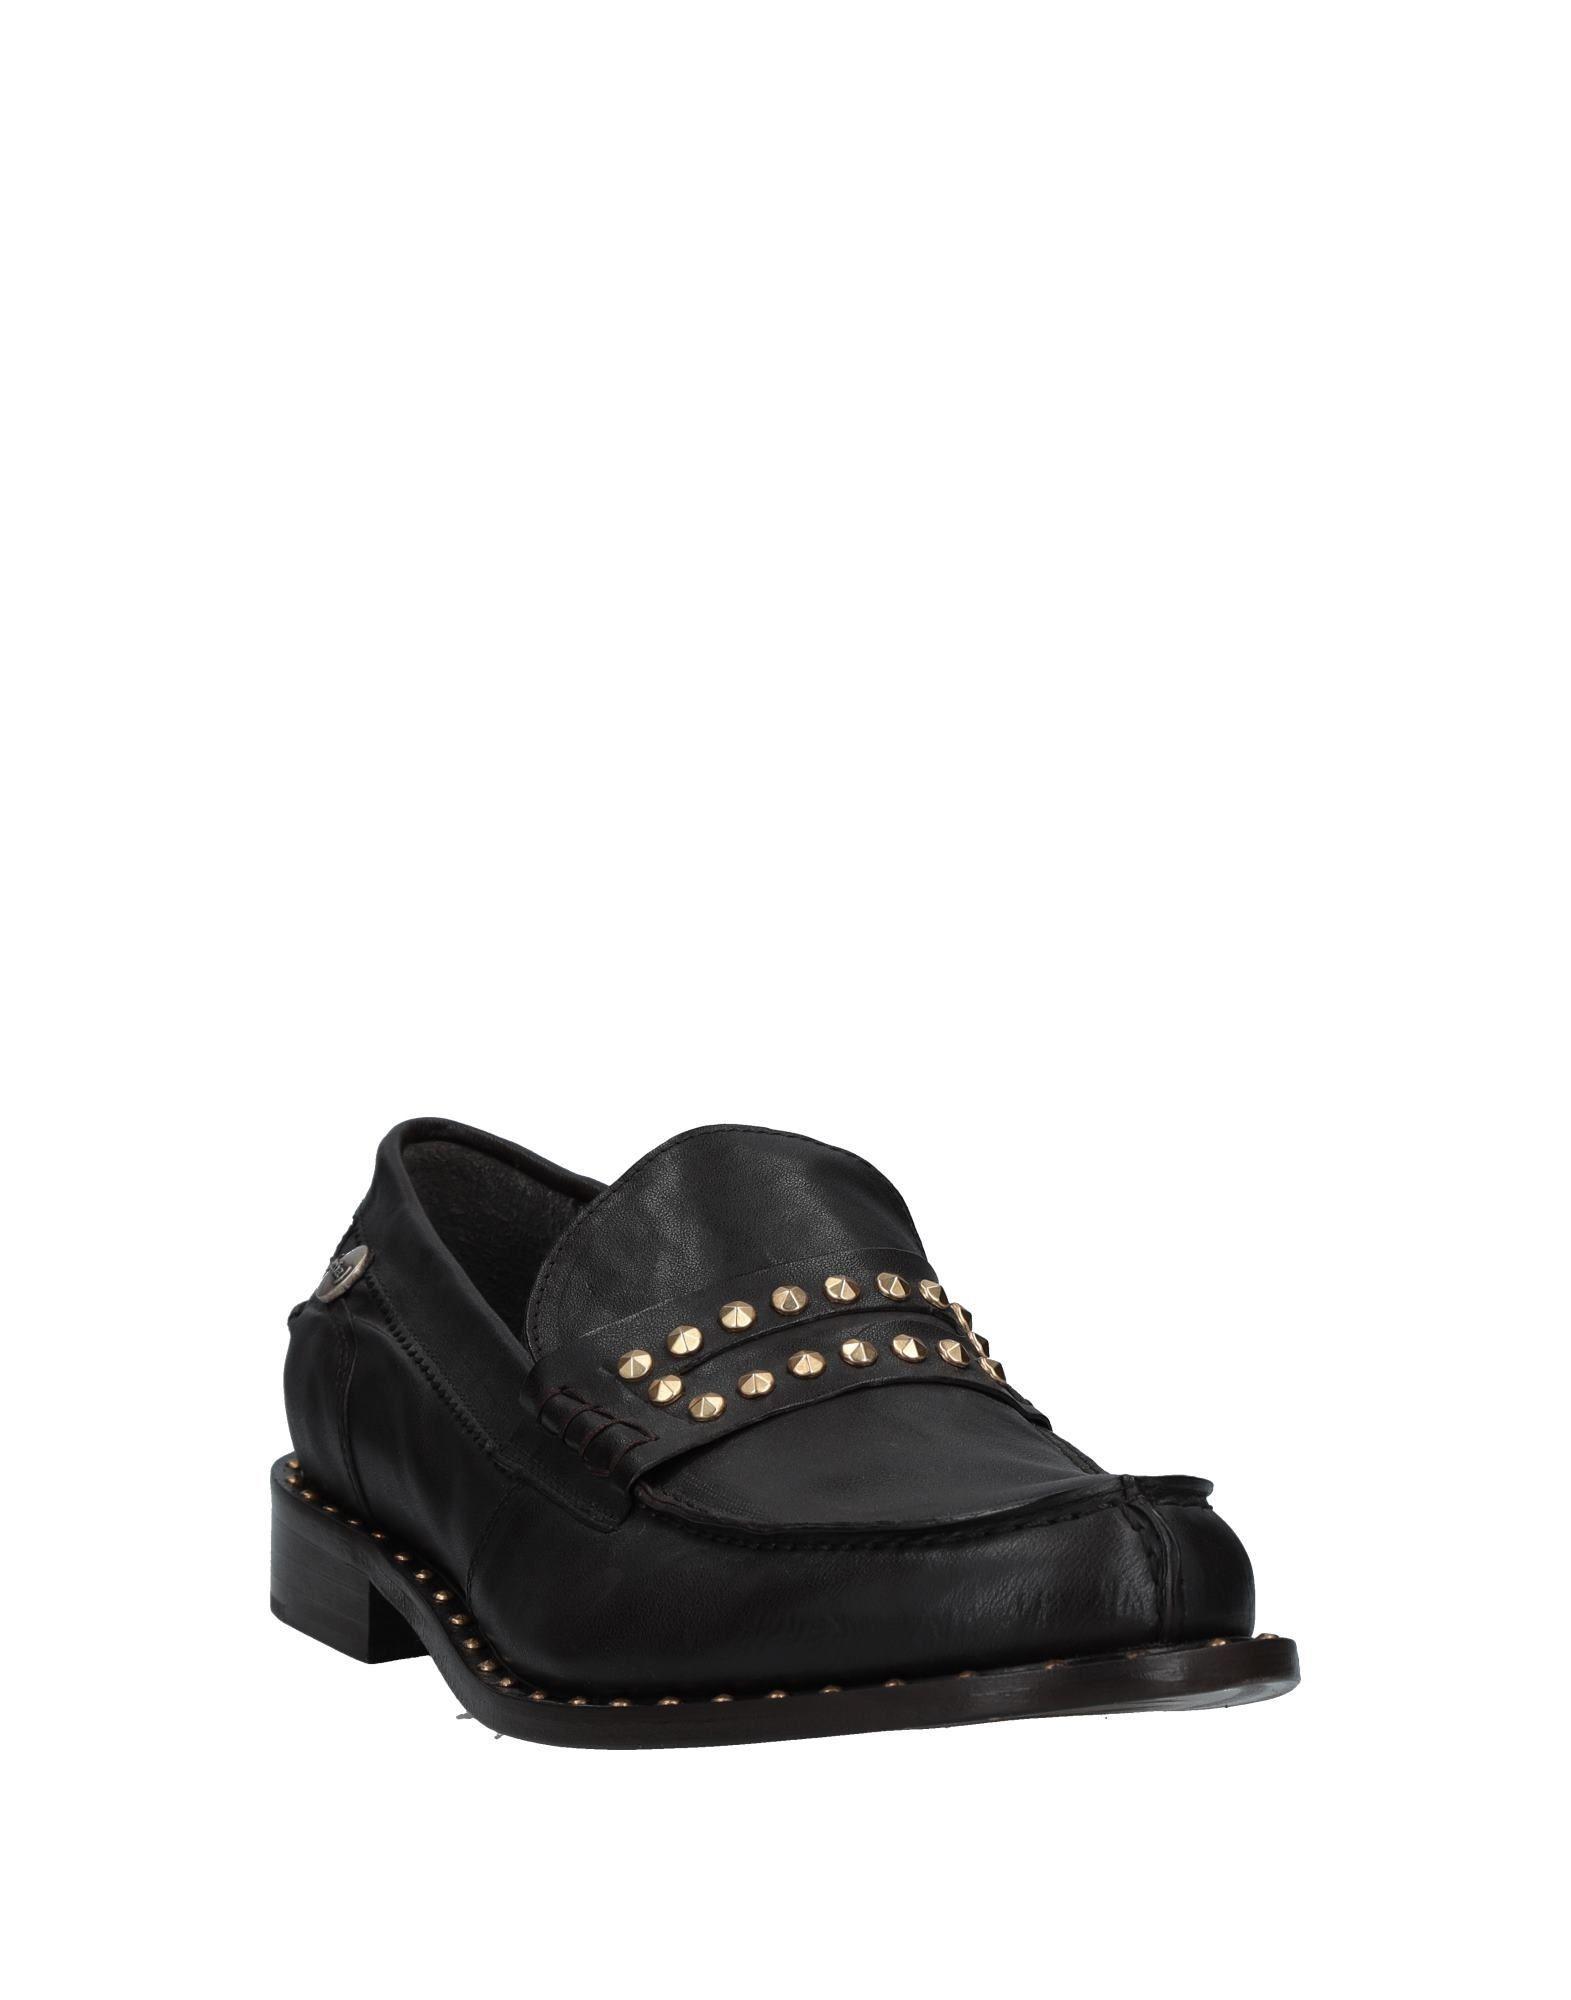 ( Verba ) Leather Loafer in Dark Brown (Brown) for Men